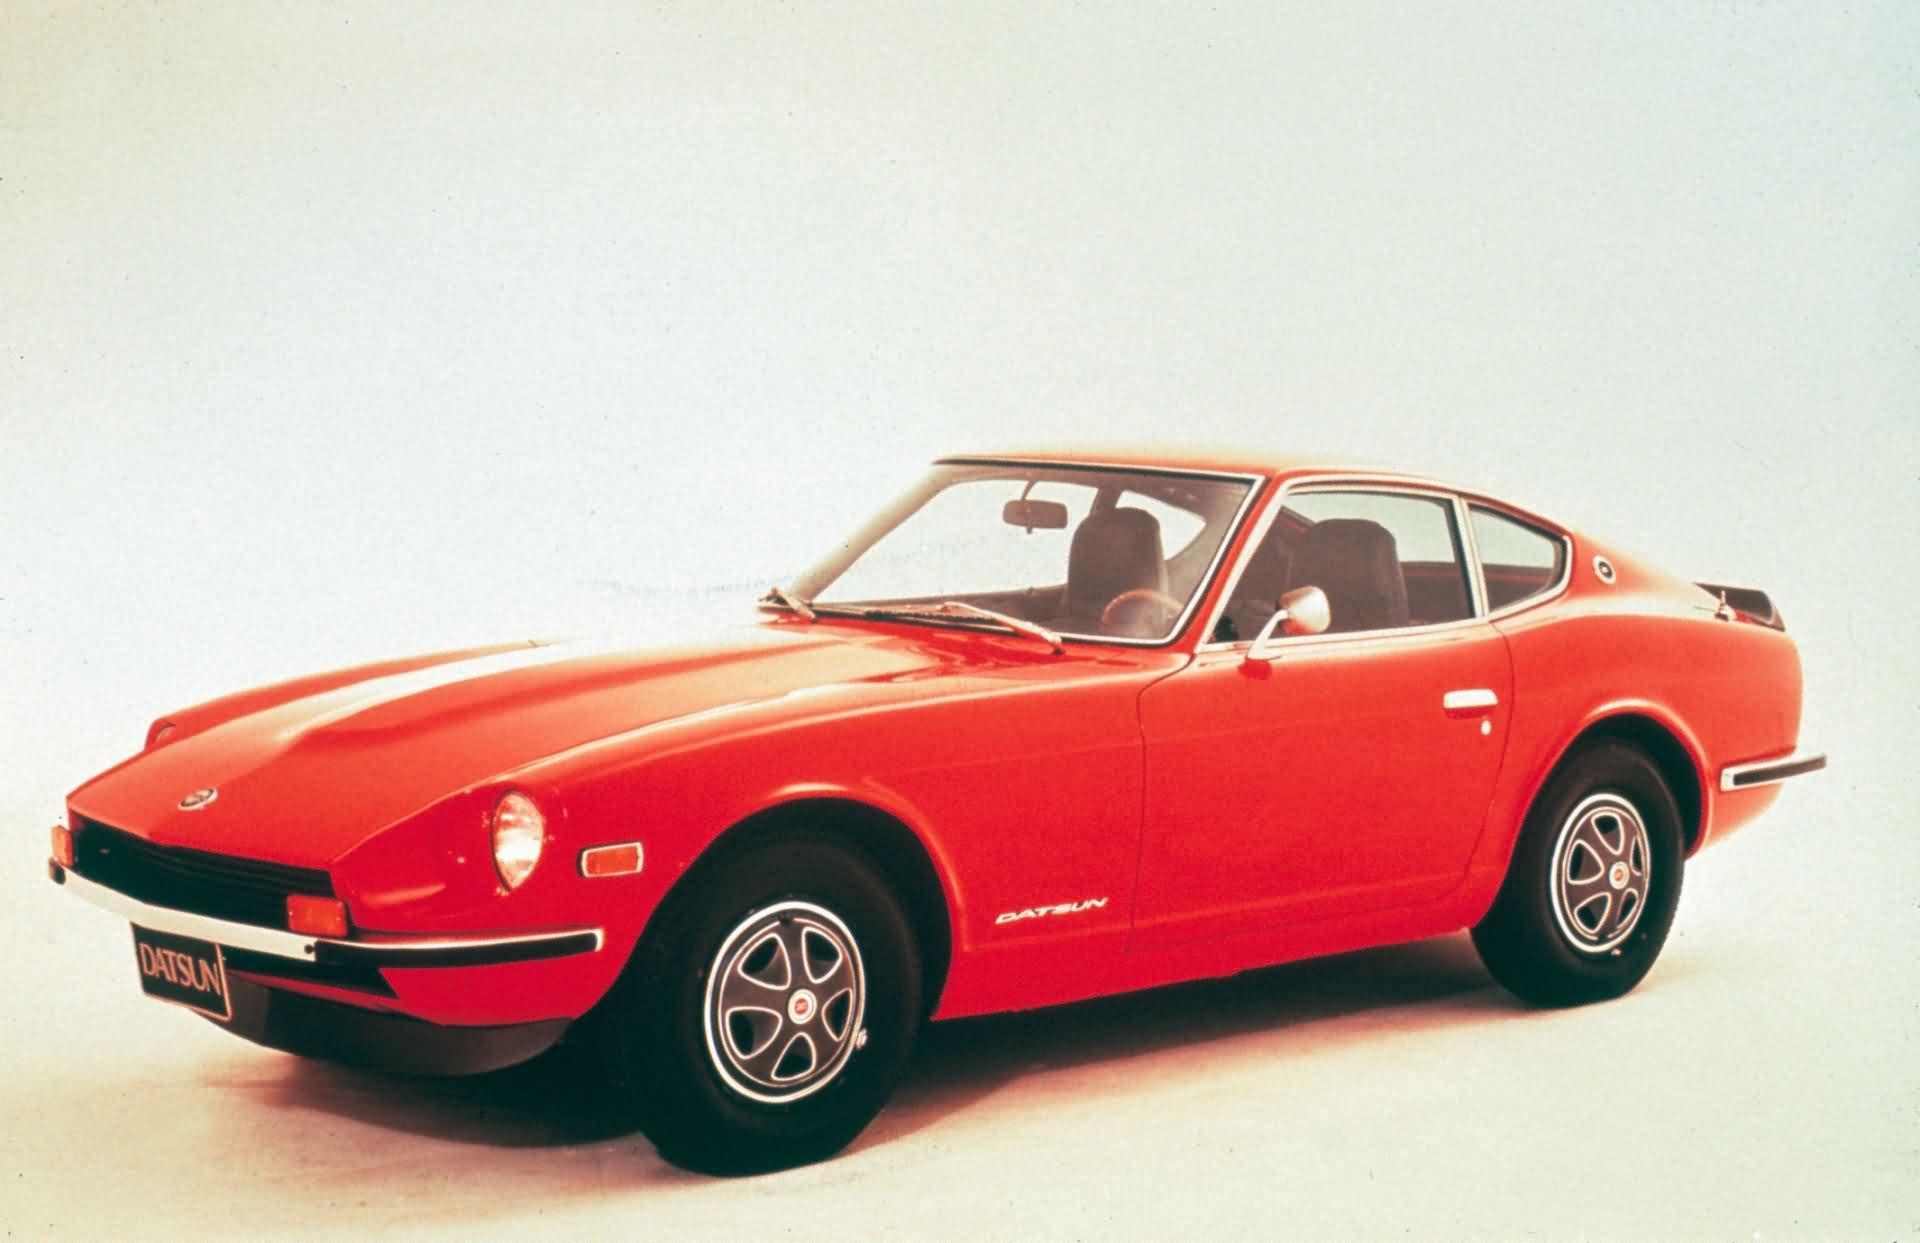 Nissan Datsun 240Z - US Version (1969)